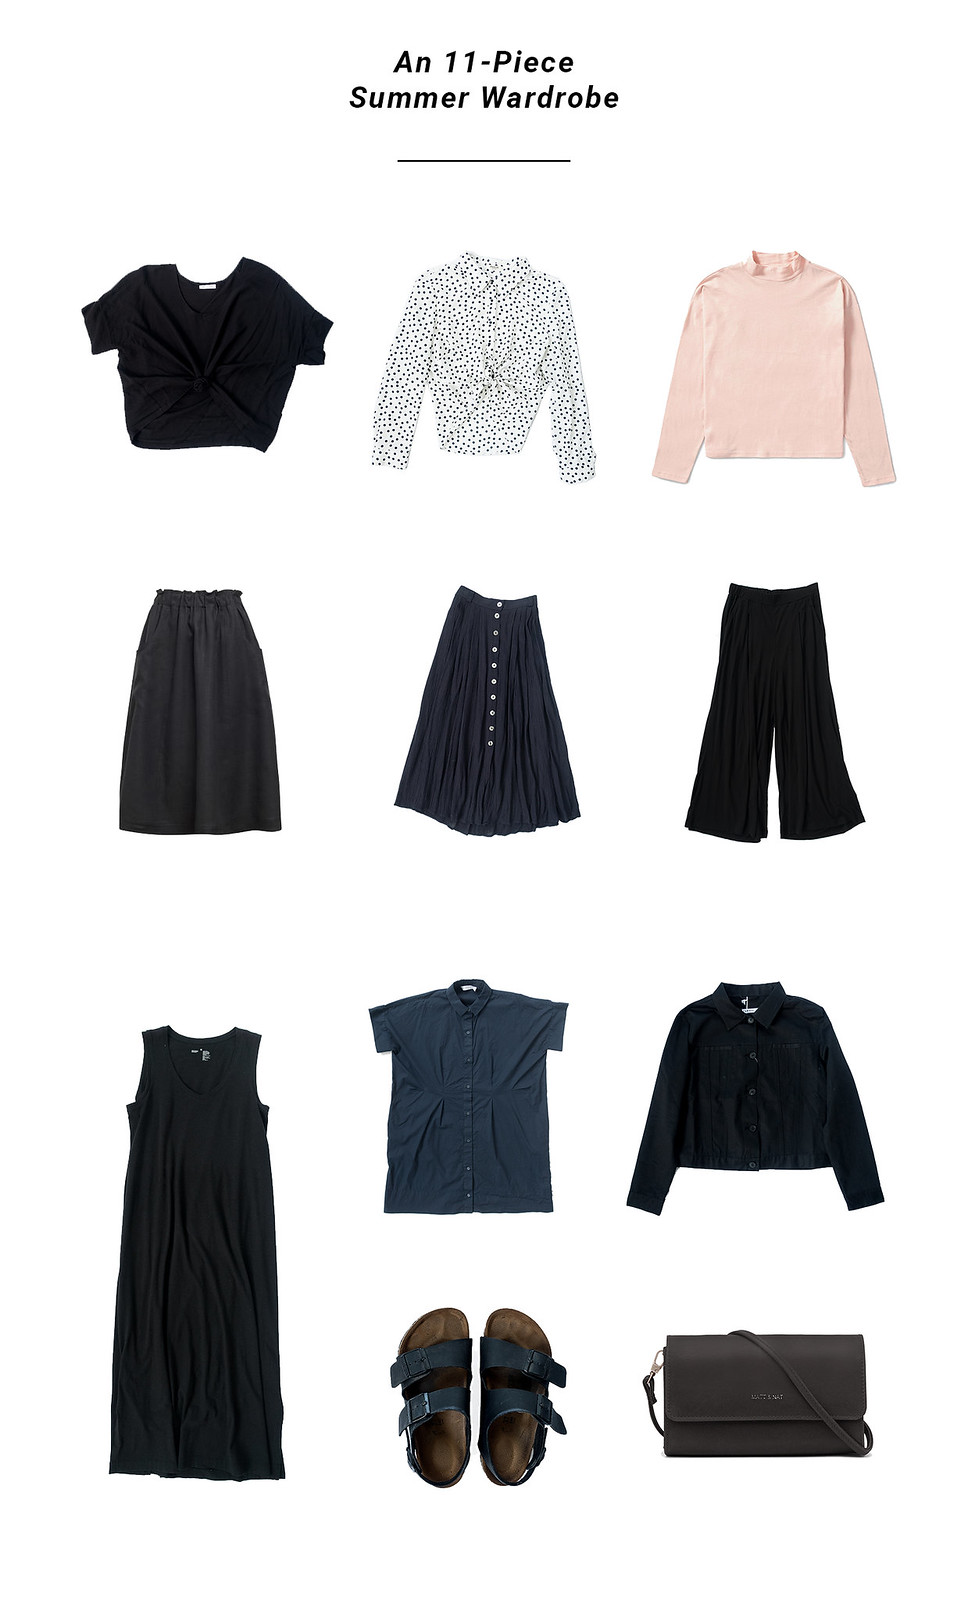 A Minimal Summer Wardrobe Capsule